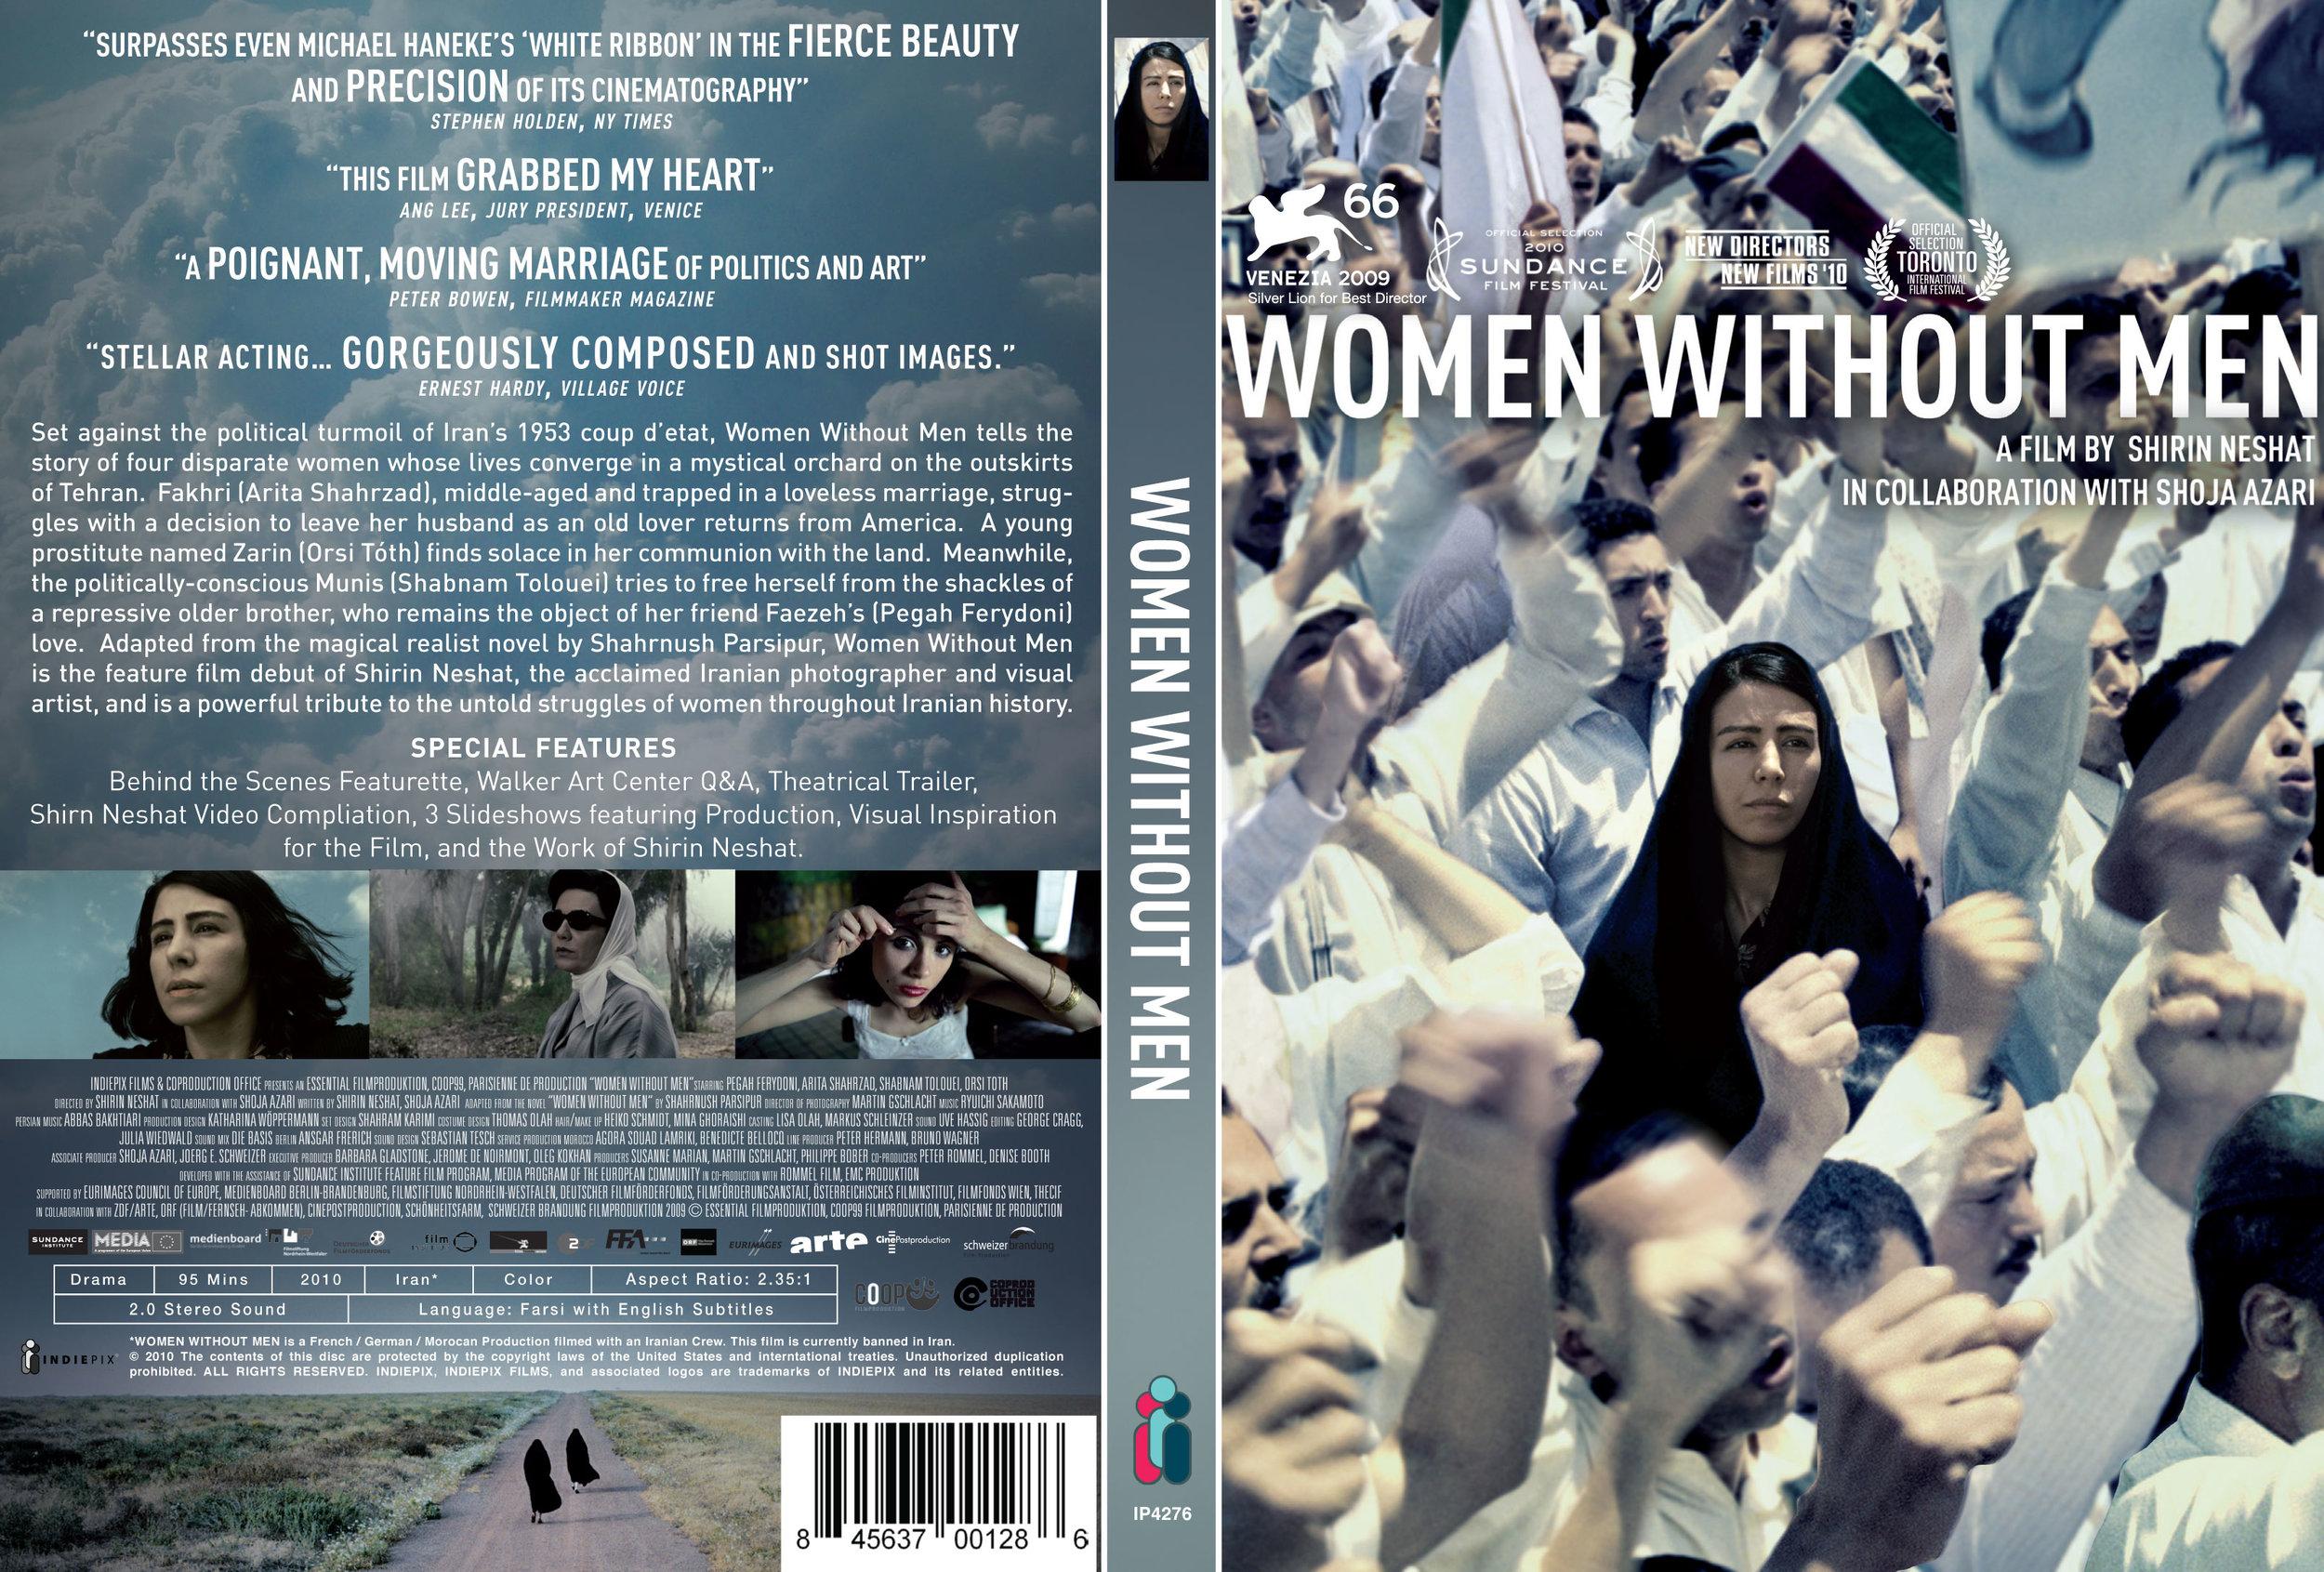 women-without-men_6965038977_o.jpg